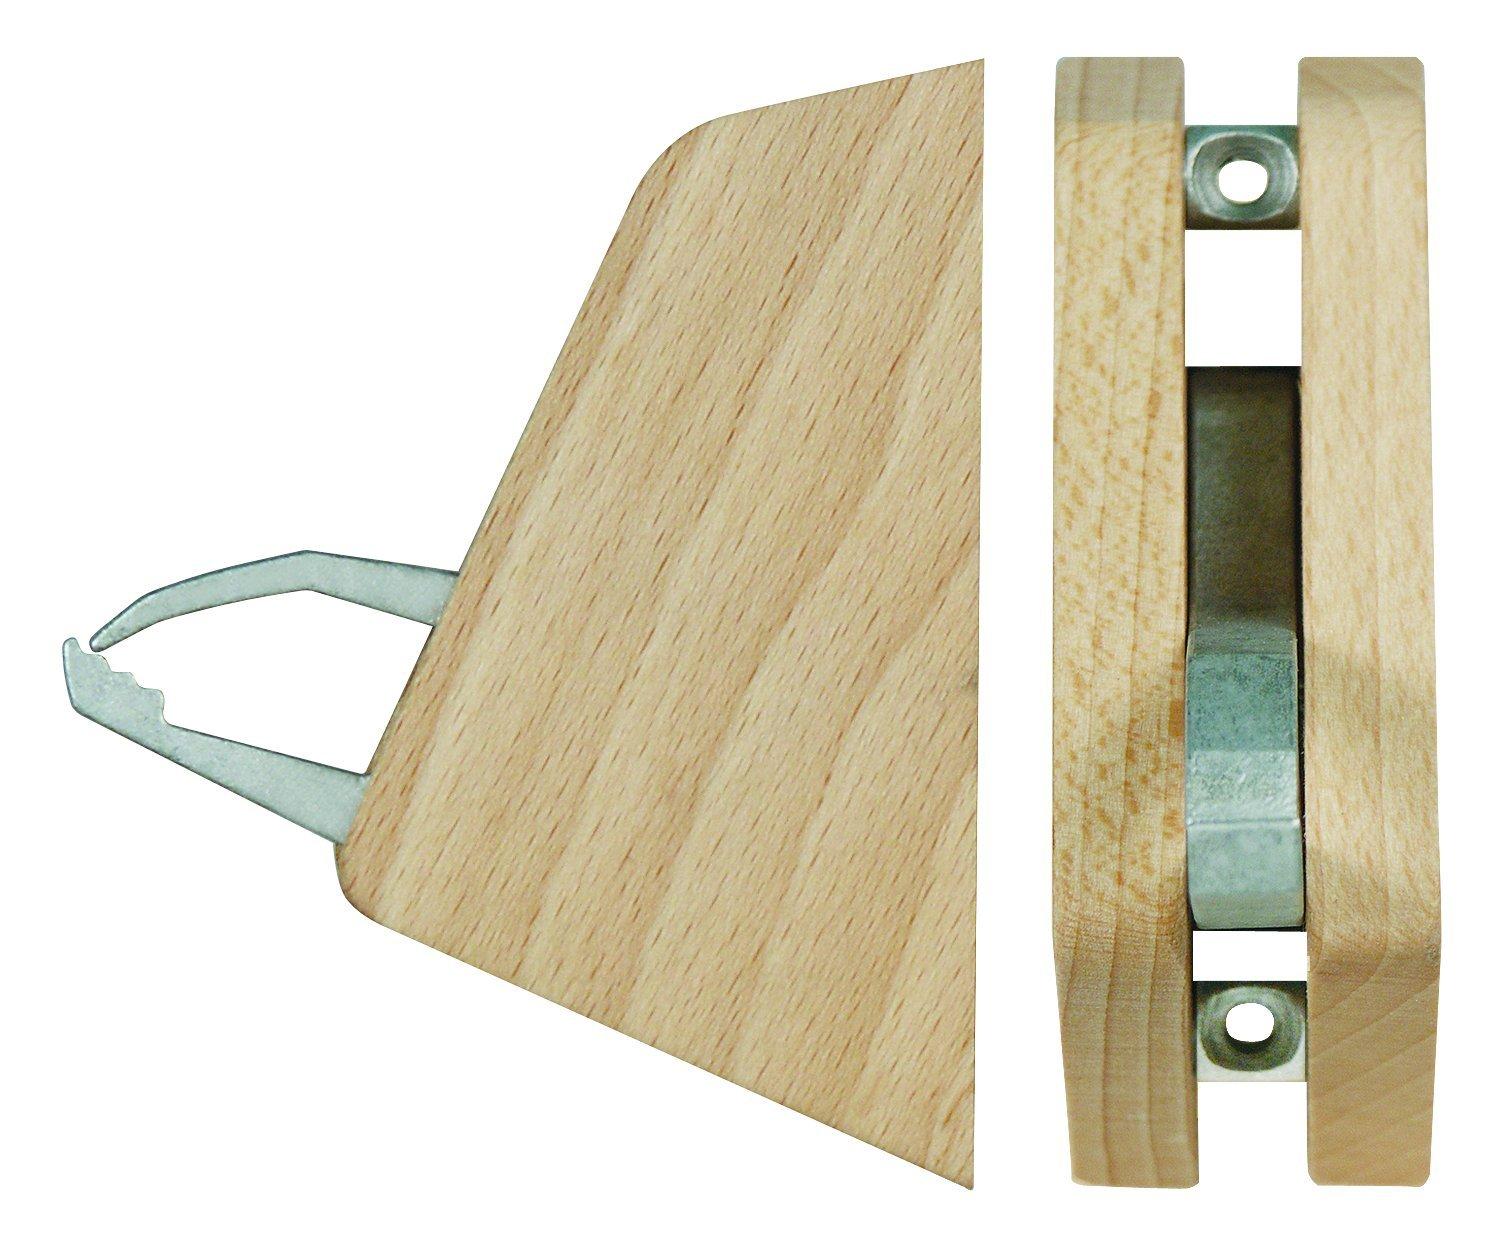 Linden Sweden Beech Wood Clever Hook